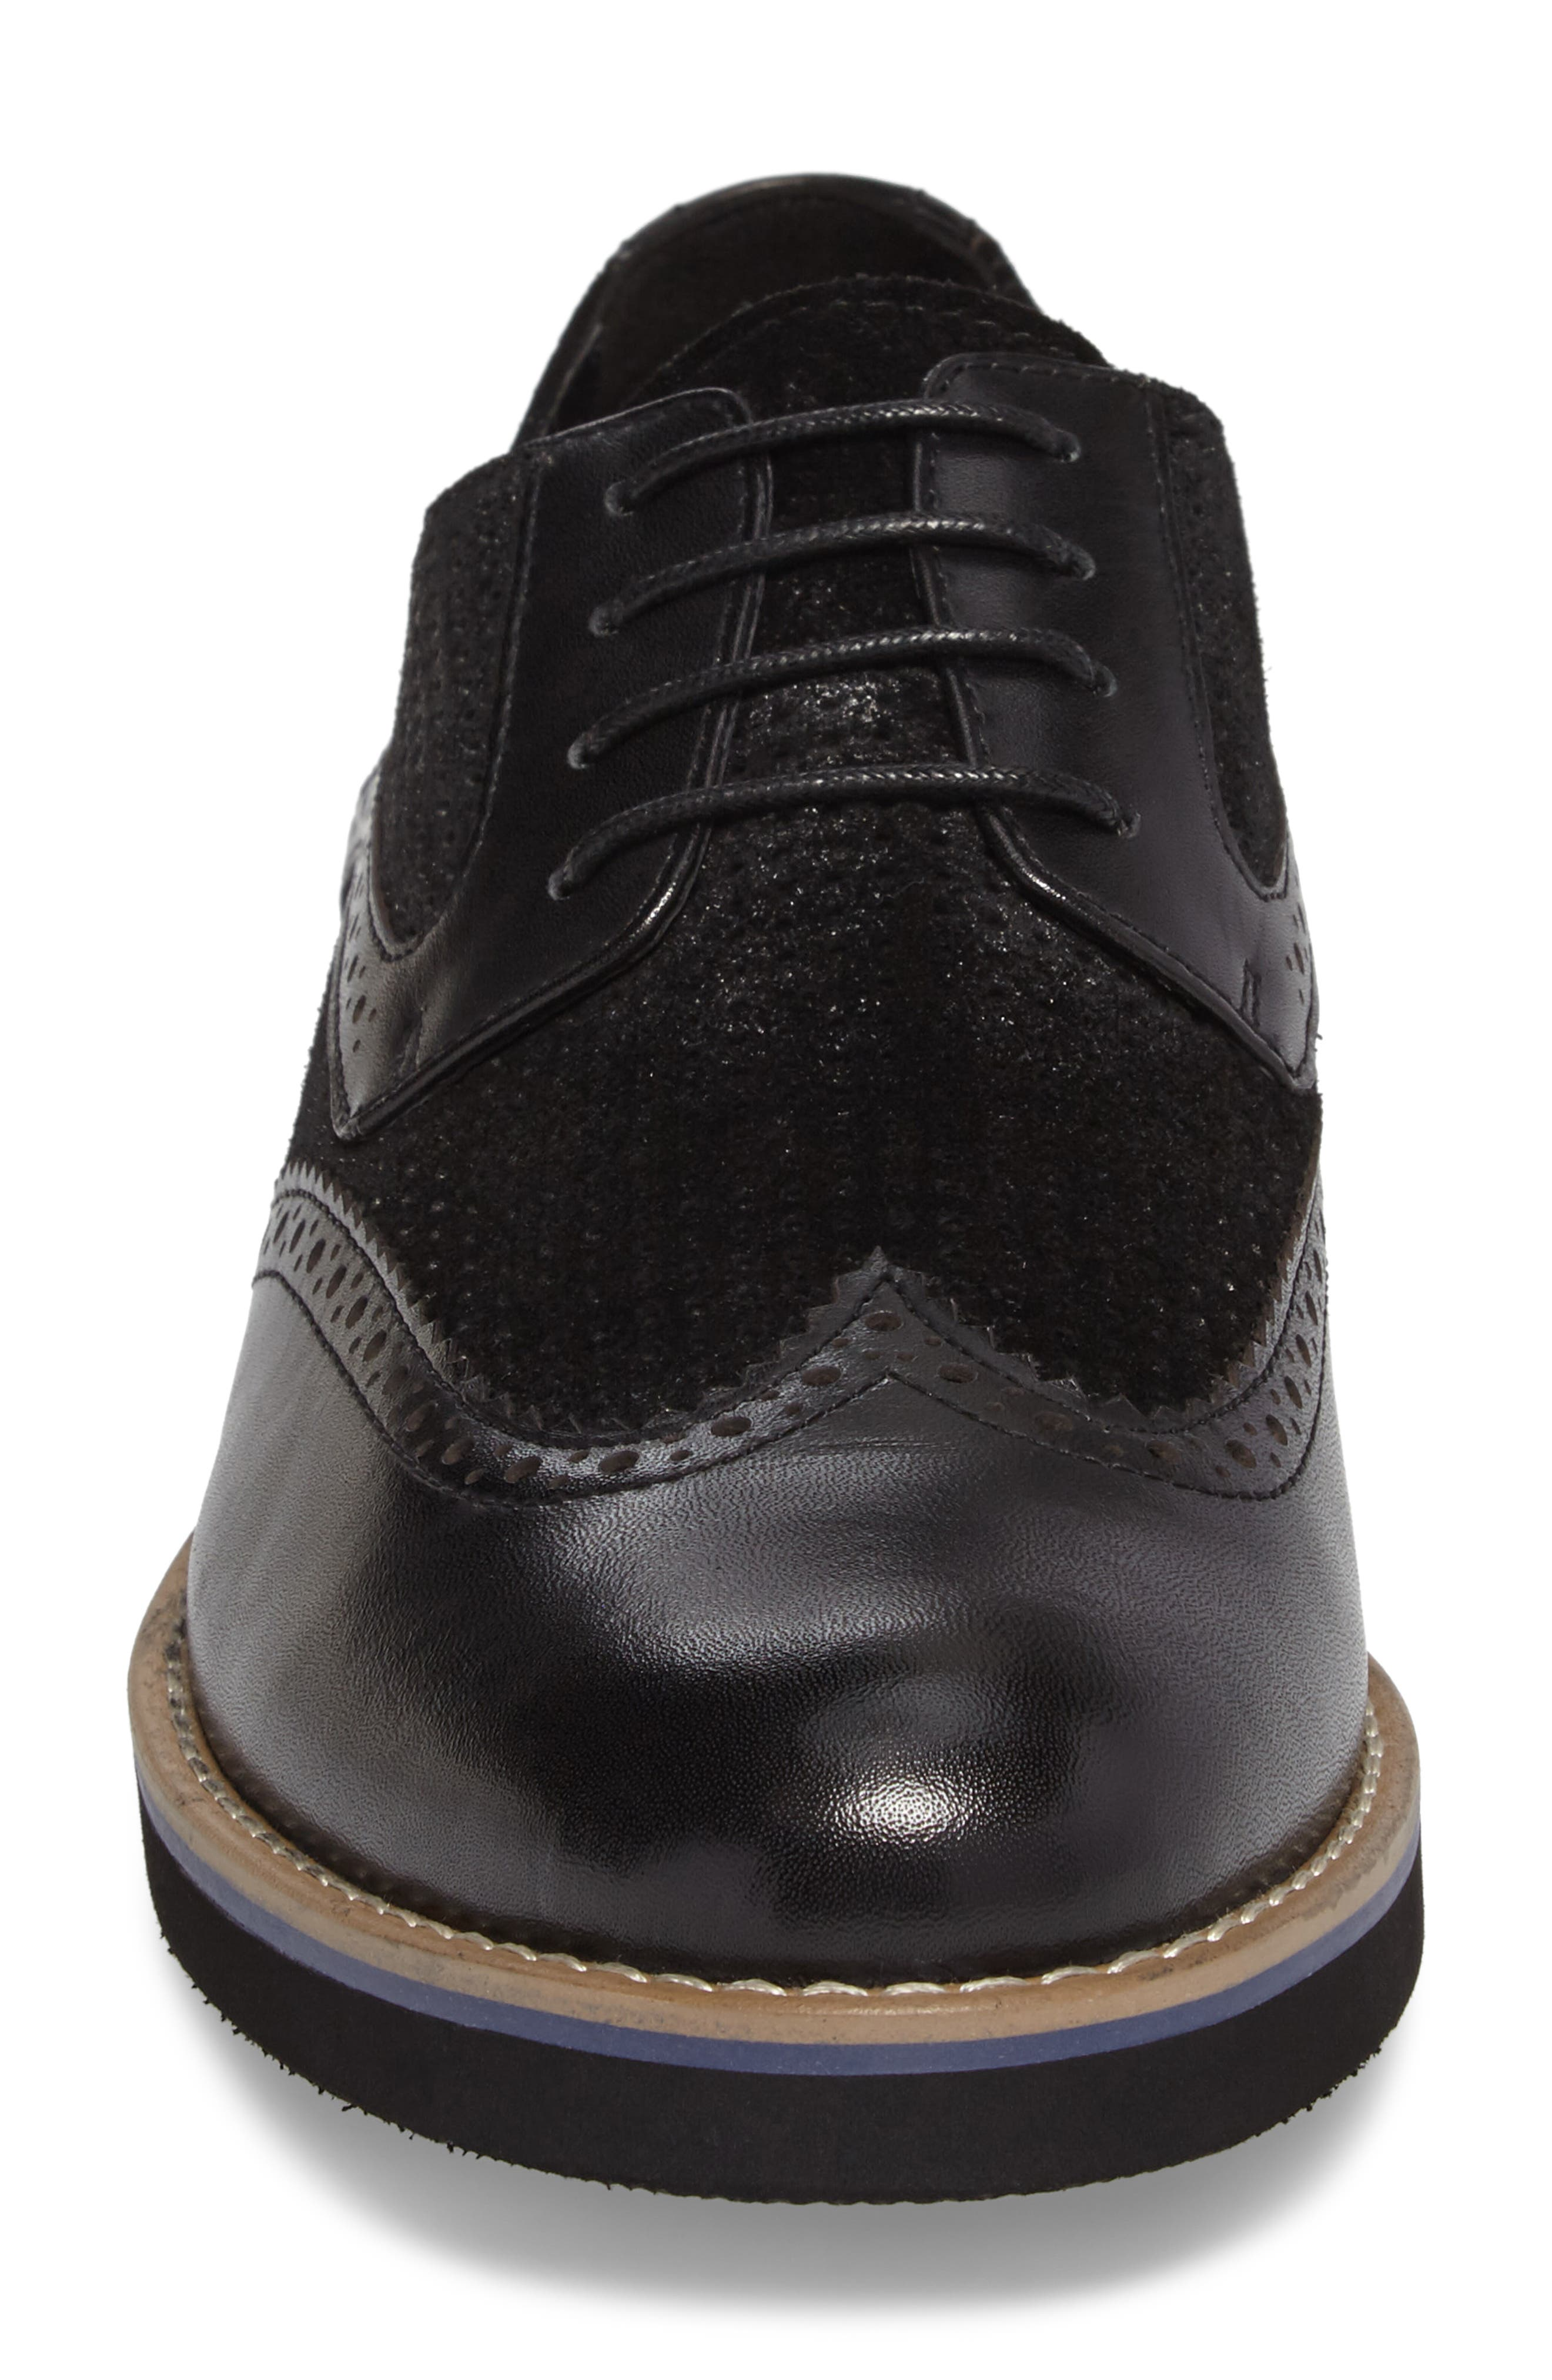 Maritime Spectator Shoe,                             Alternate thumbnail 4, color,                             Black Leather